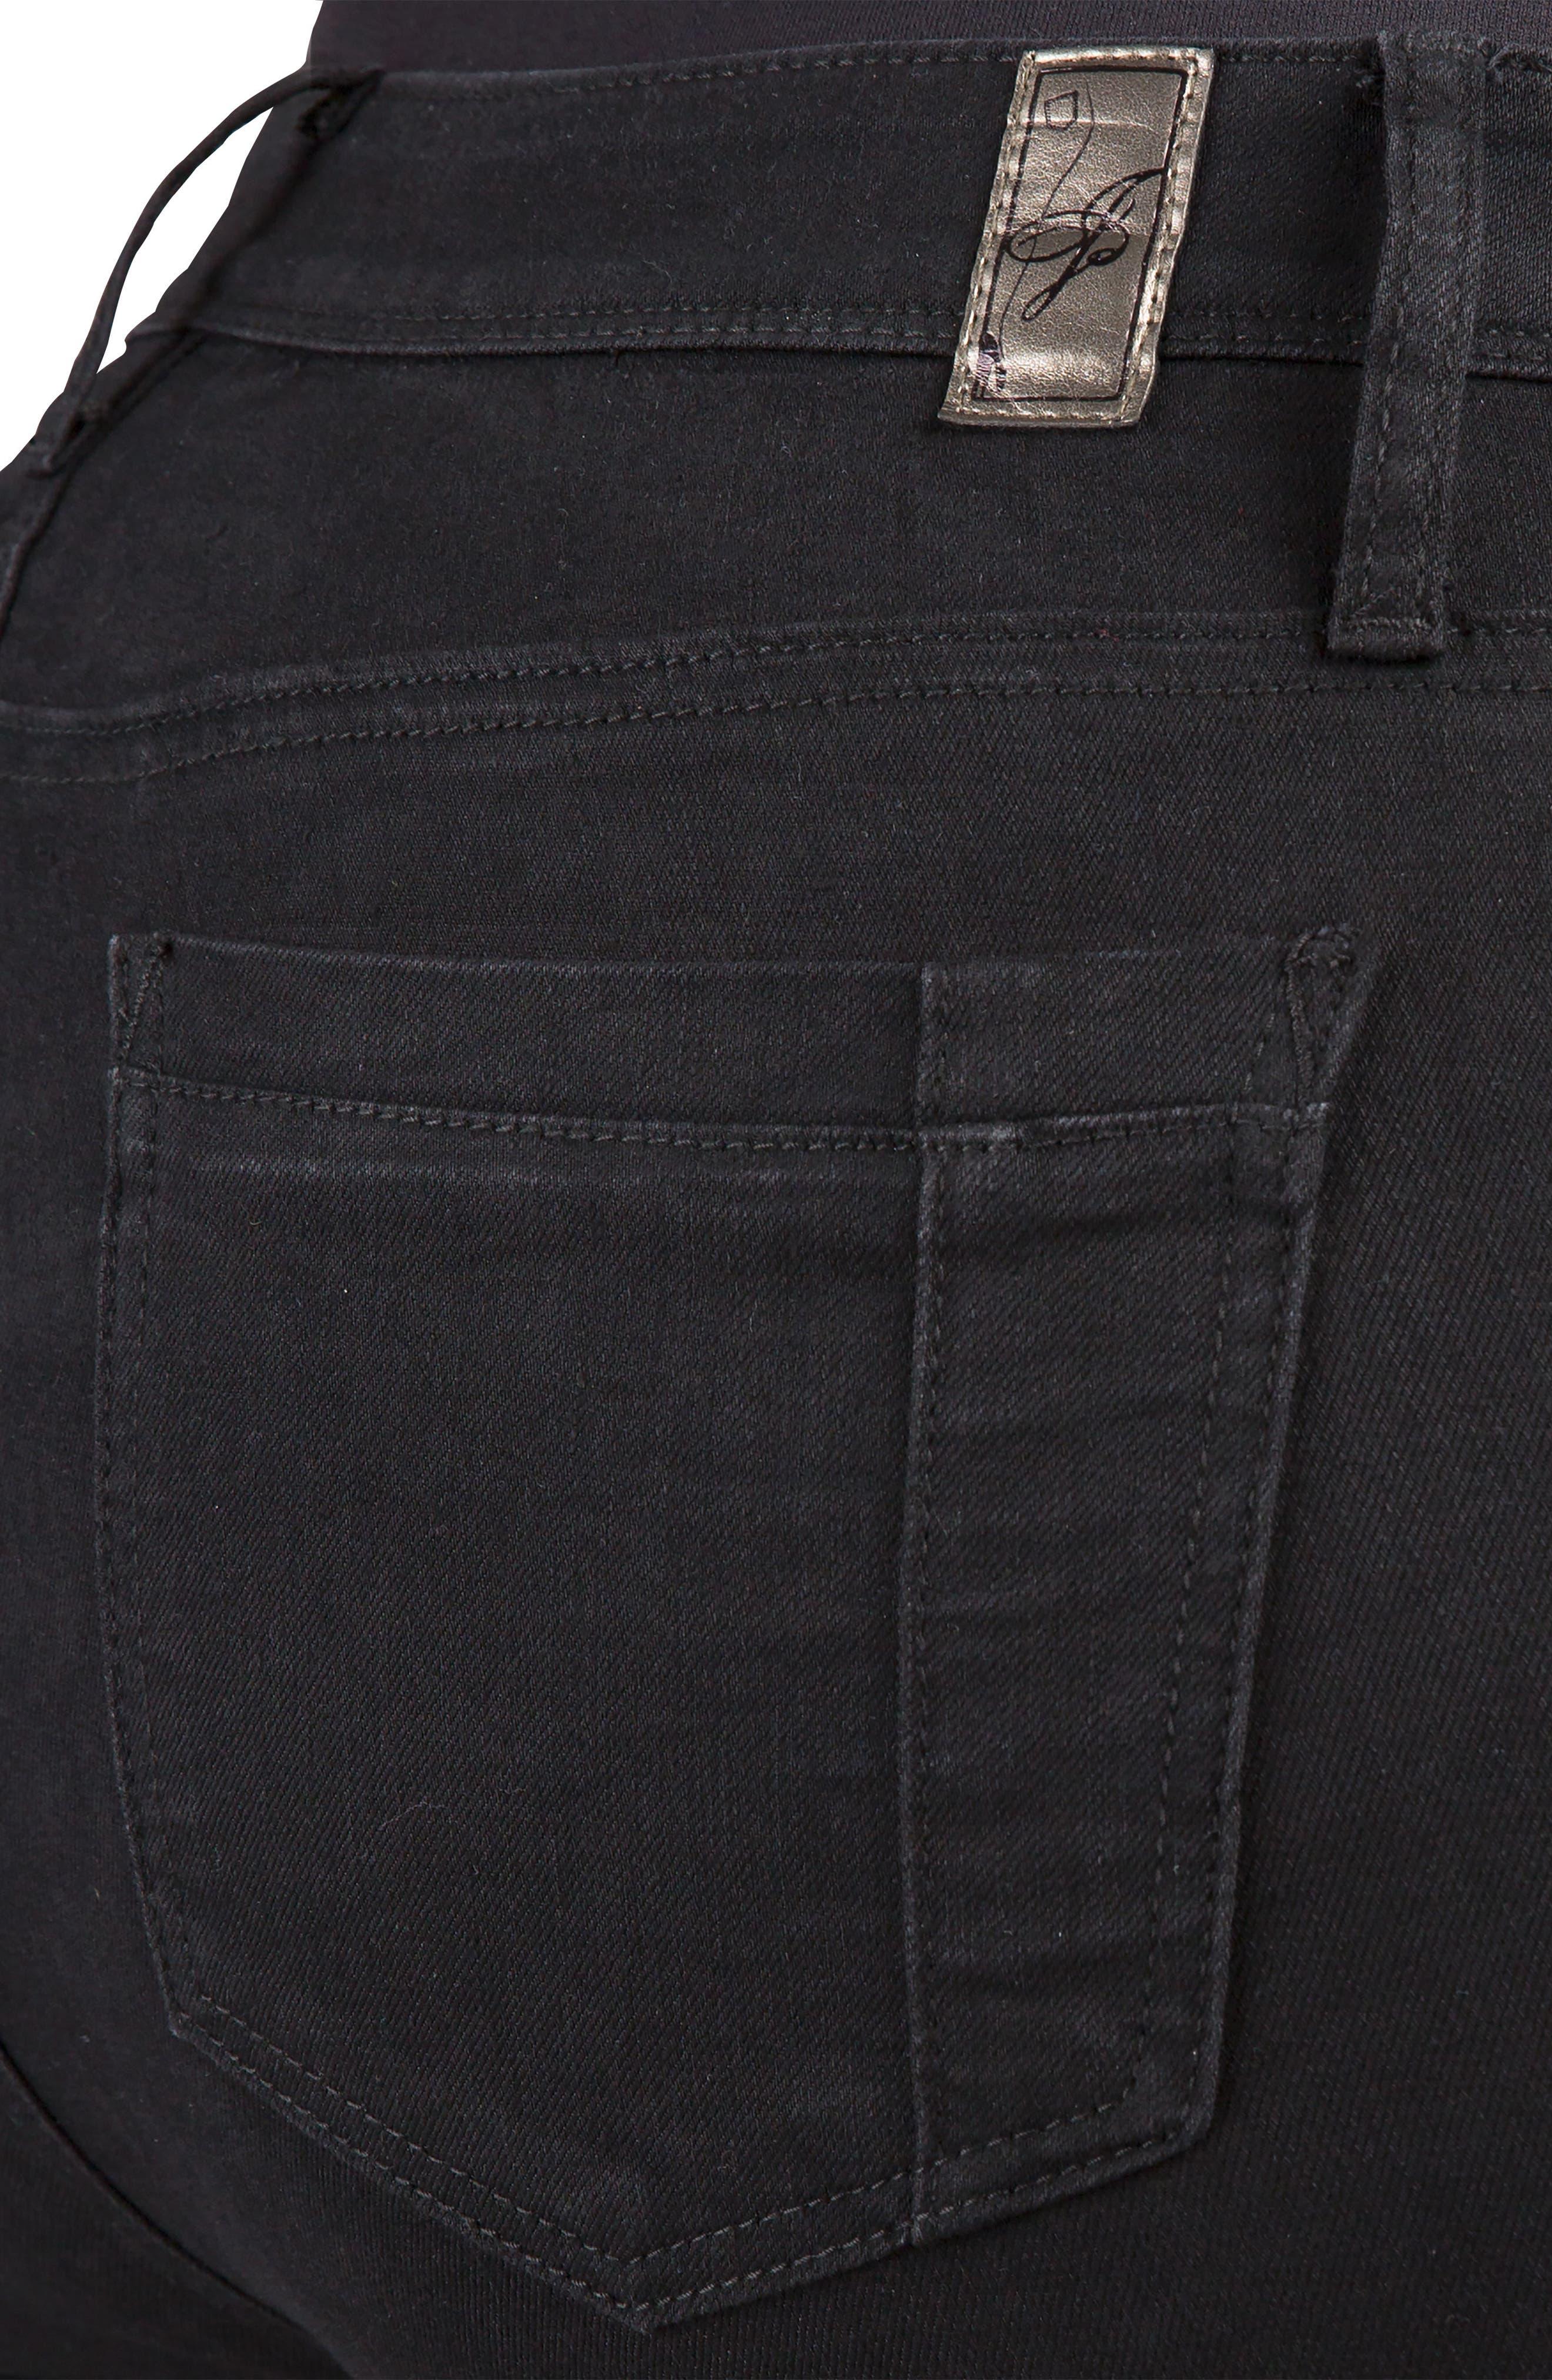 POETIC JUSTICE, Scarlett Slim Bootcut Curvy Fit Jeans, Alternate thumbnail 4, color, RINSE BLACK